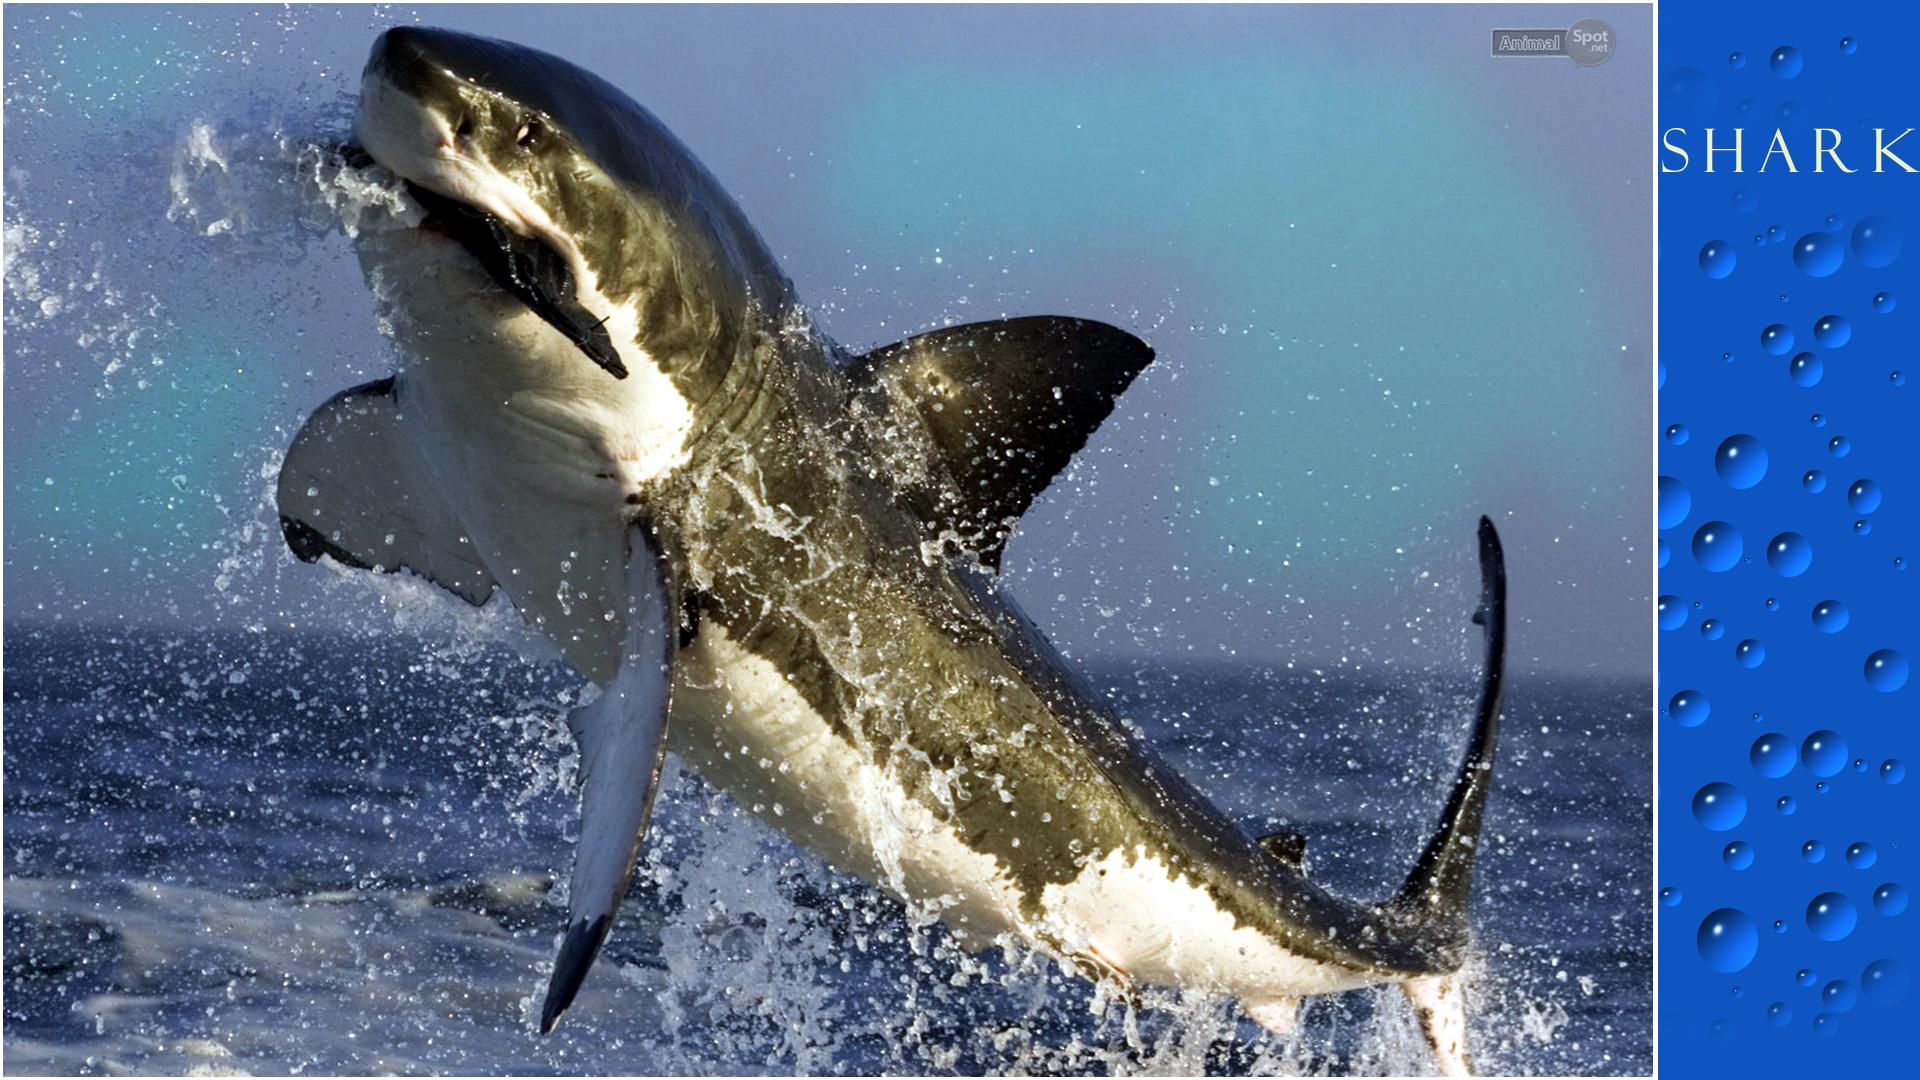 live shark wallpaper - photo #10